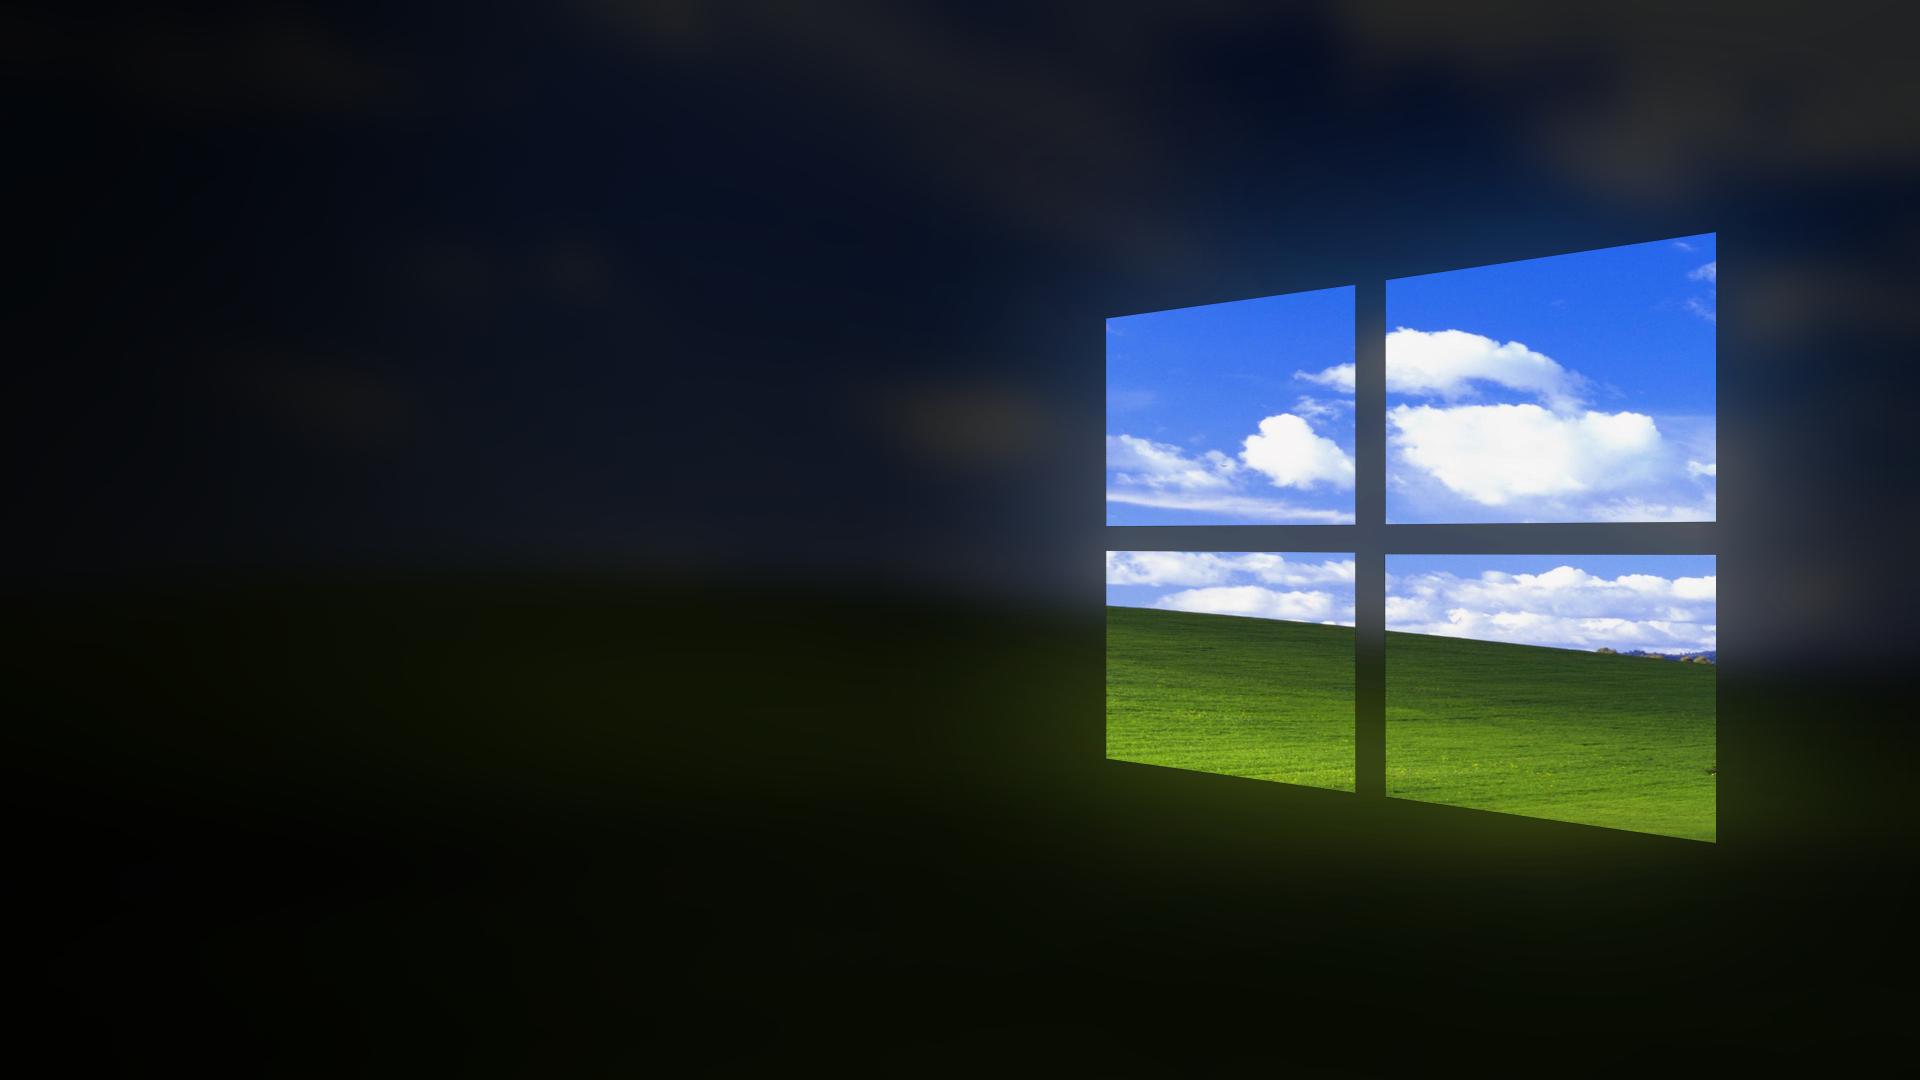 I made a basic Windows 10XP wallpaper 19201080 Windows10 1920x1080